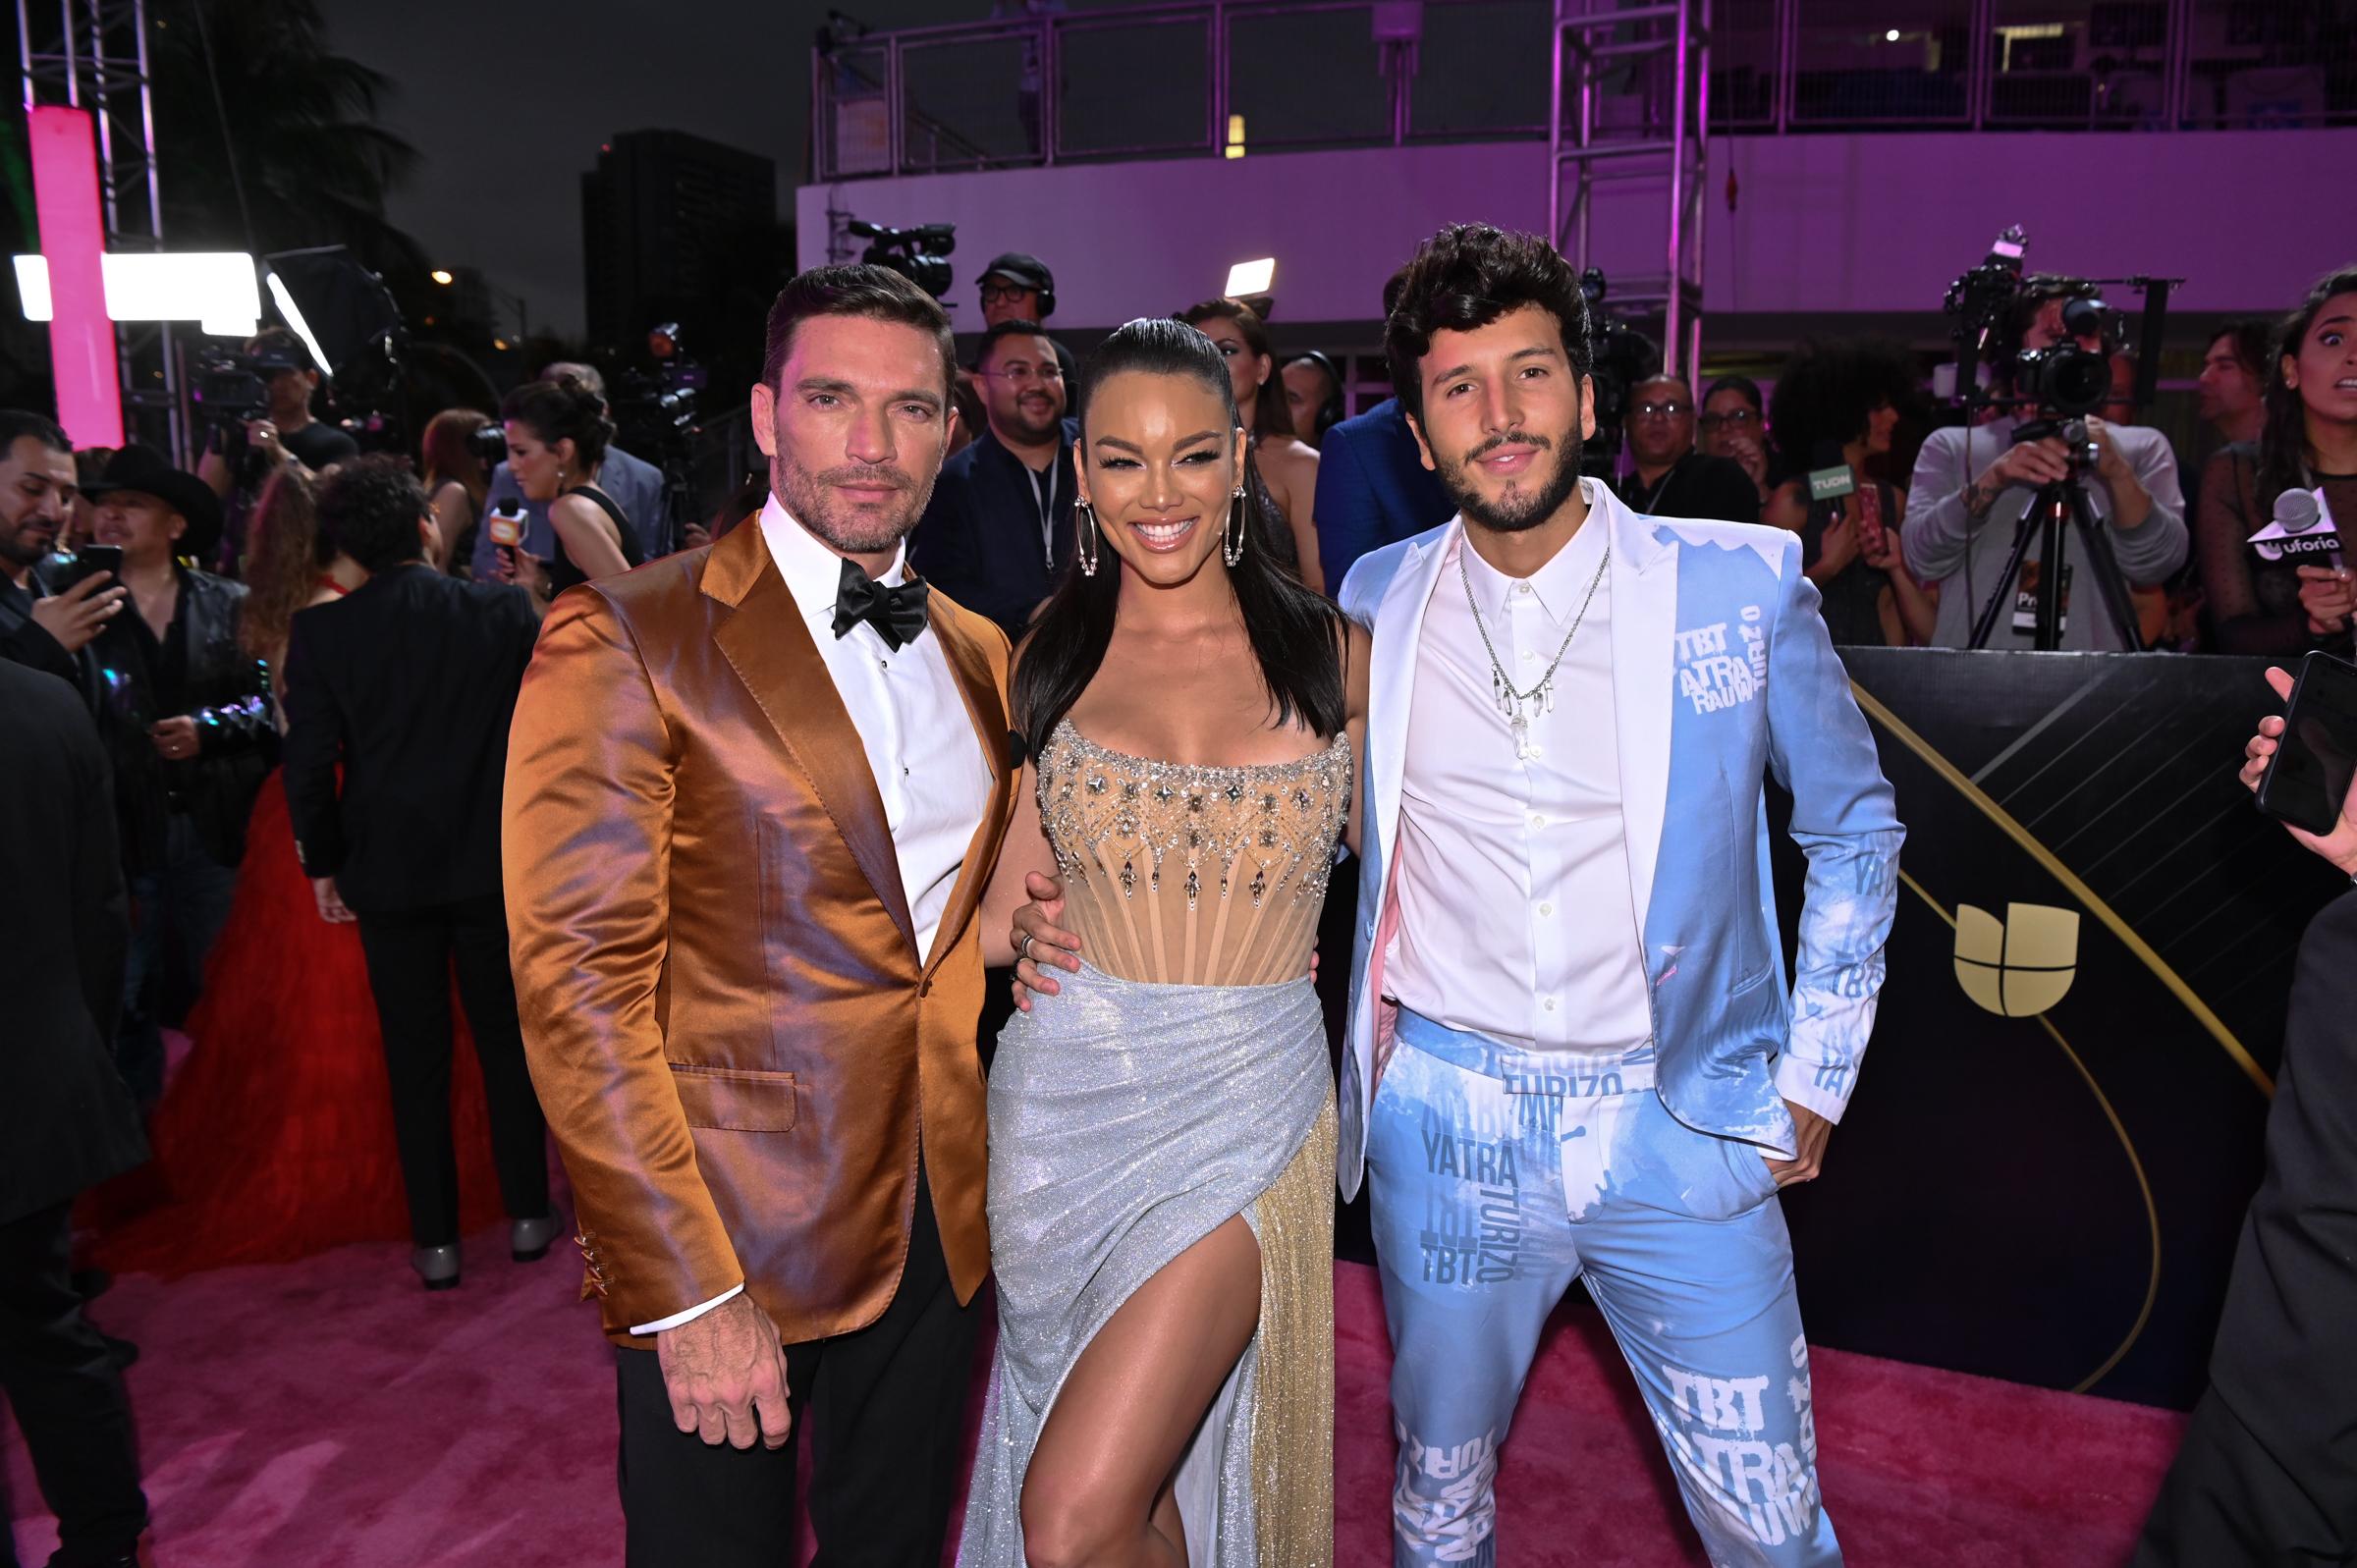 Zuleyka Rivera, vestida de Sadek Majed, posó junto a Julián Gil y Sebastián Yatra. (Suministradas)